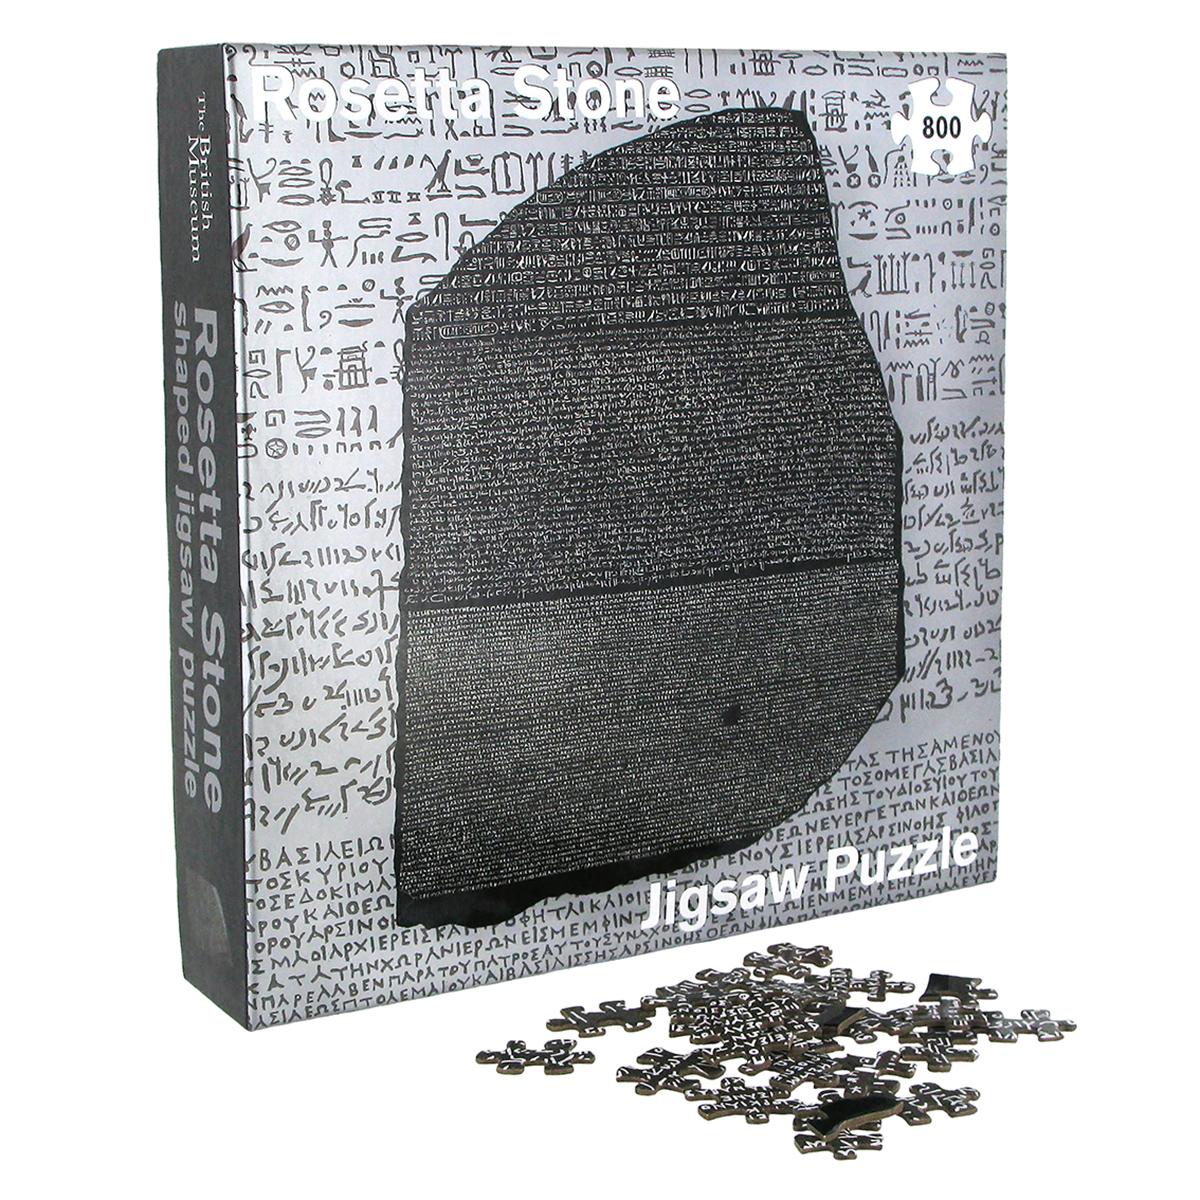 Rosetta Stone jigsaw puzzle